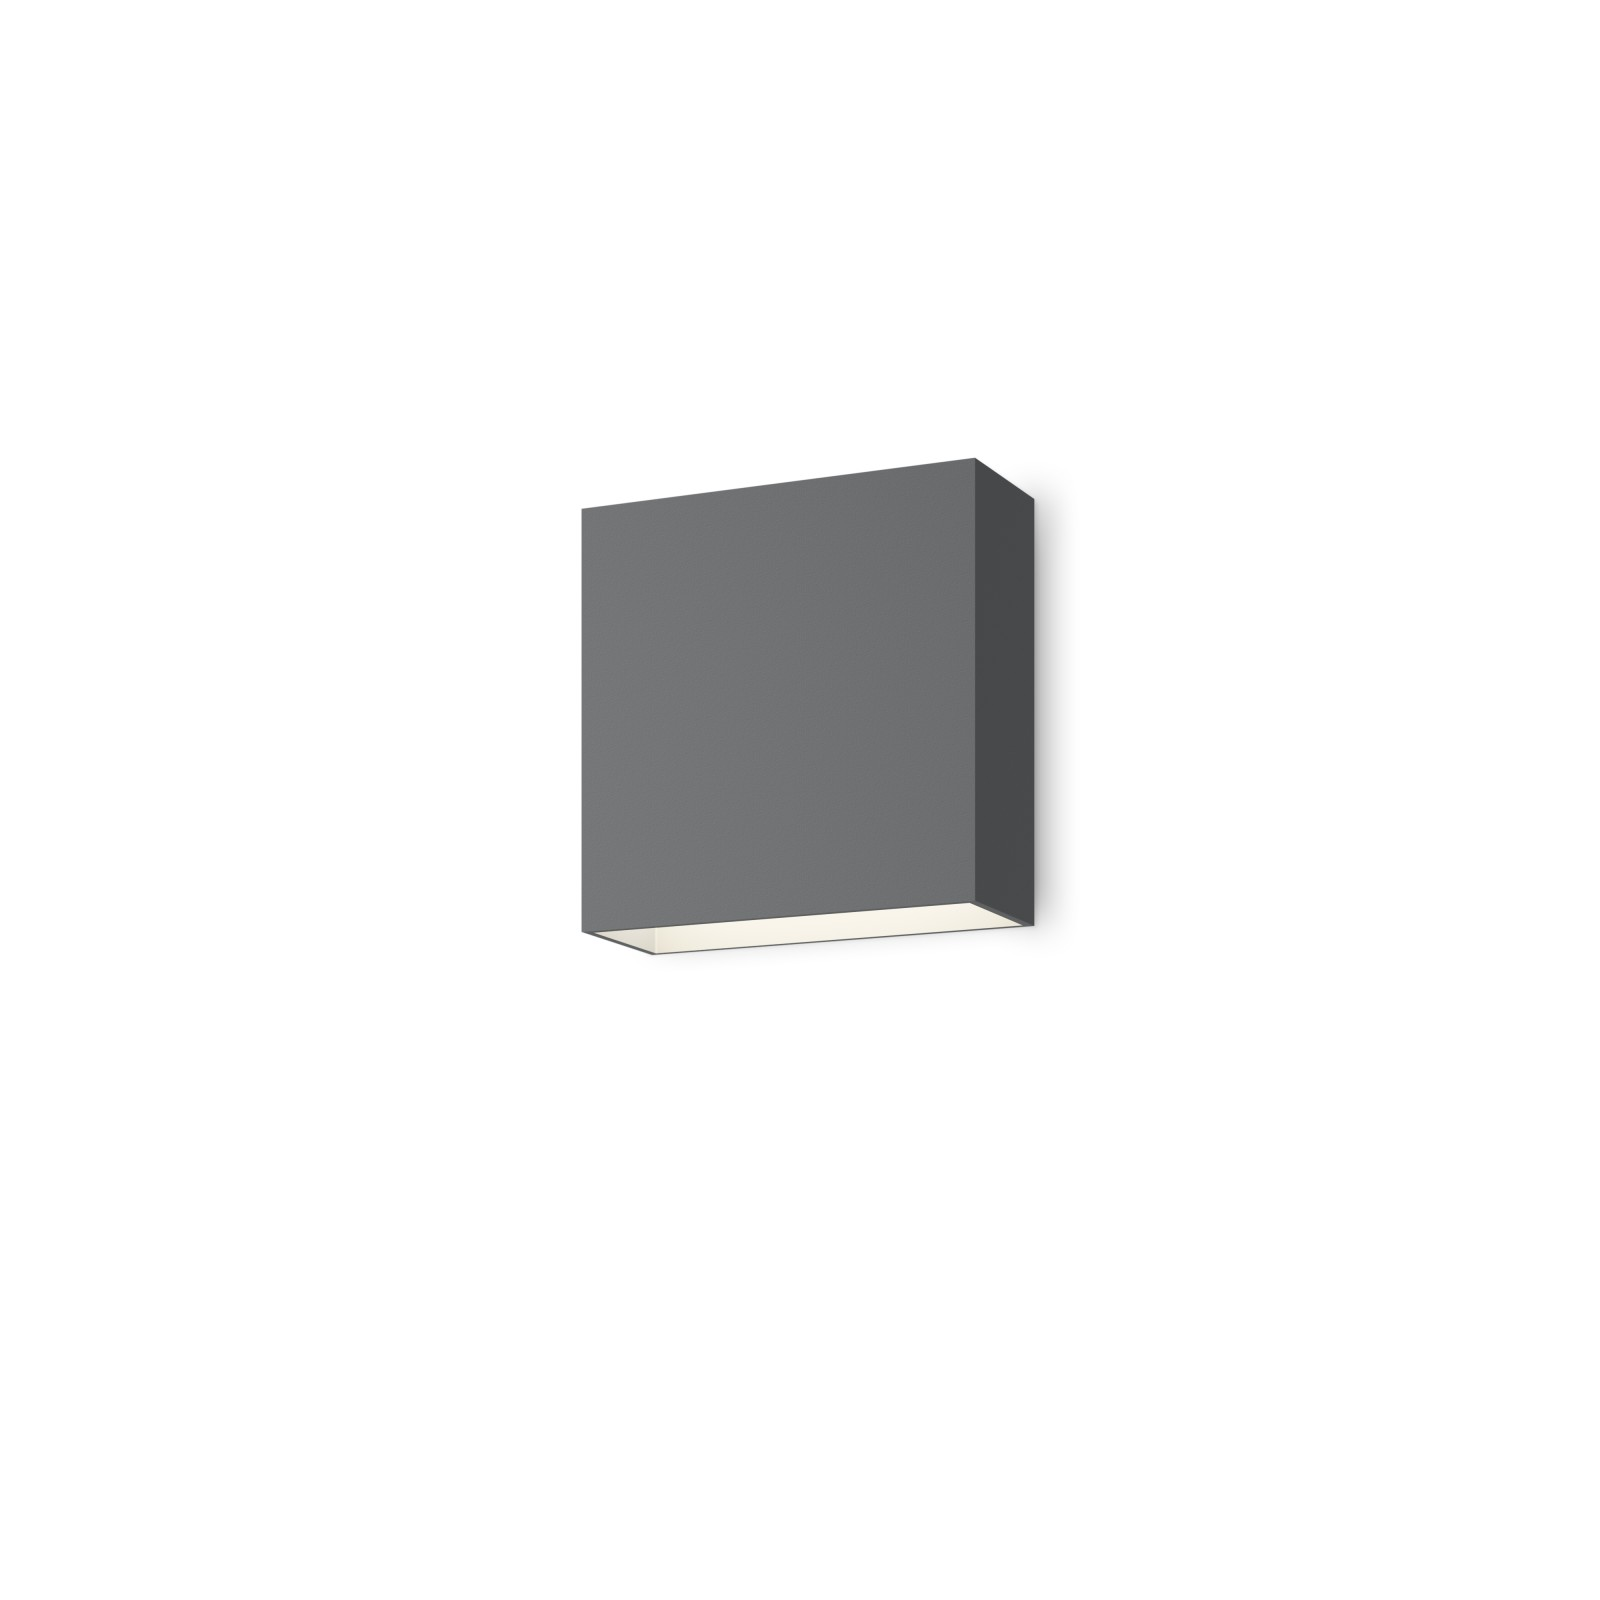 Structural 2600 Wall Lamp Matt grey lacquer